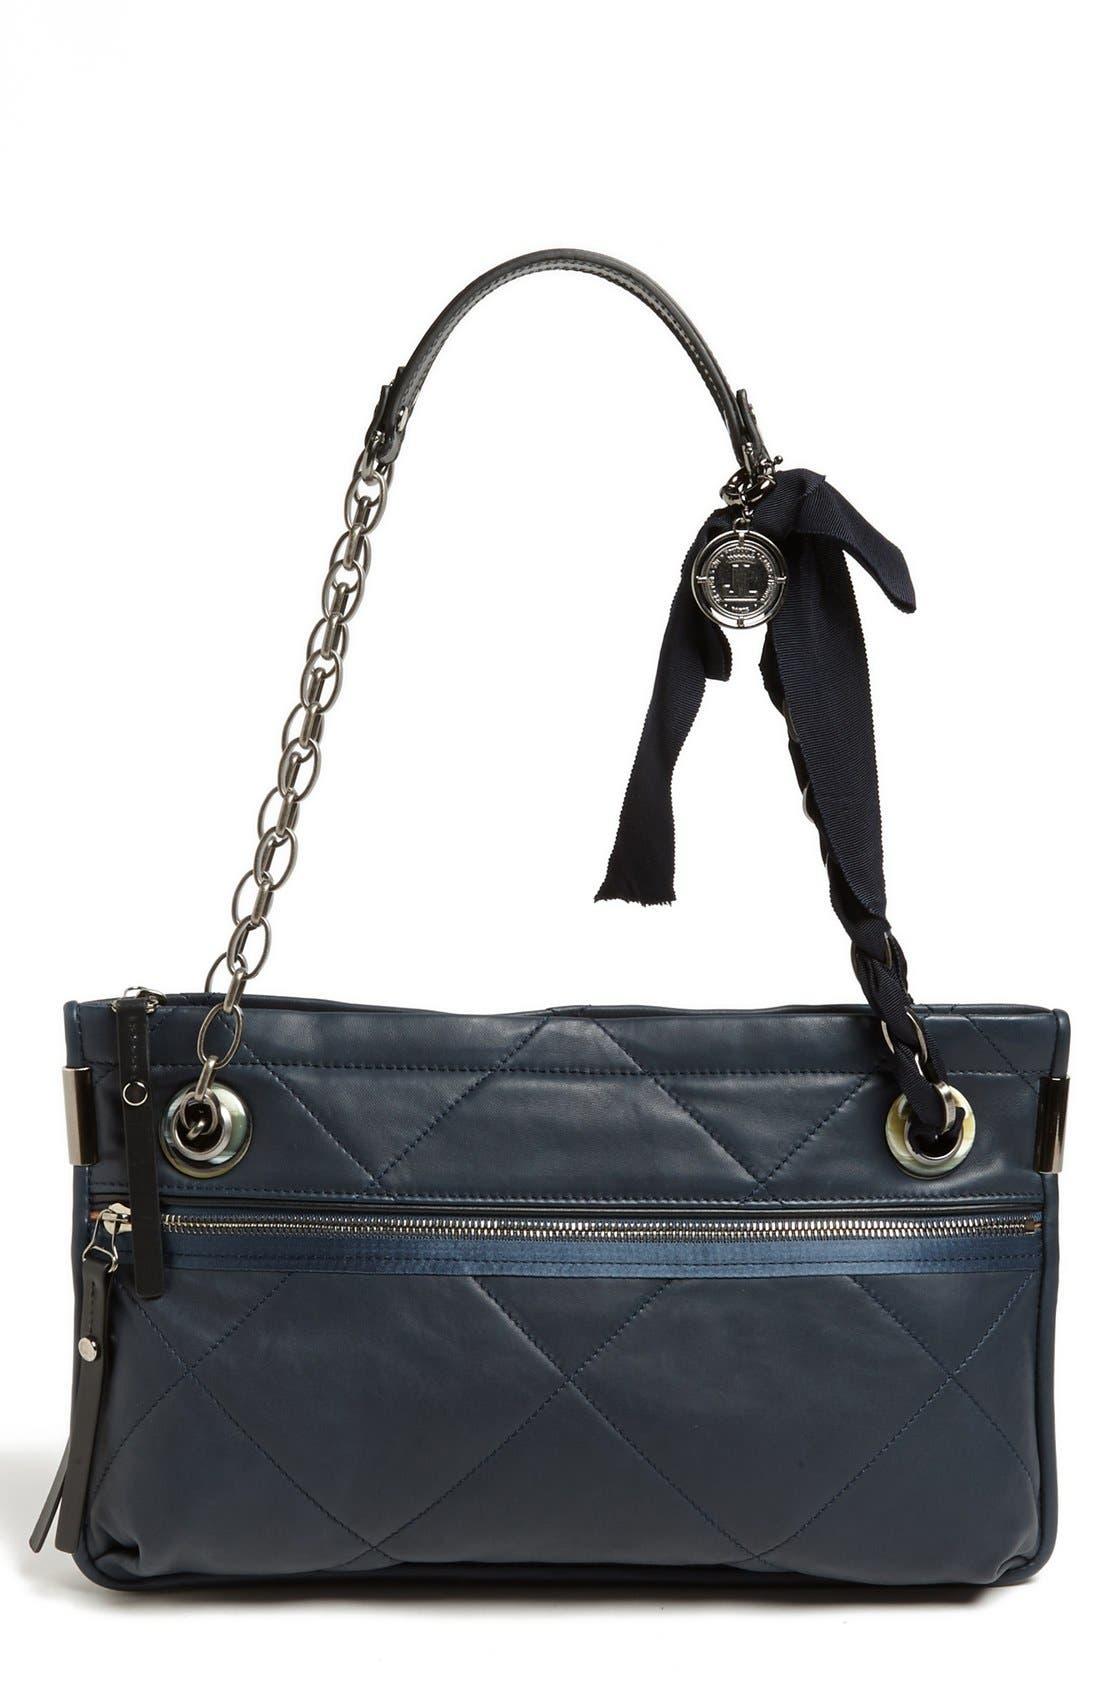 Main Image - Lanvin 'Amalia' Shoulder Bag, Small